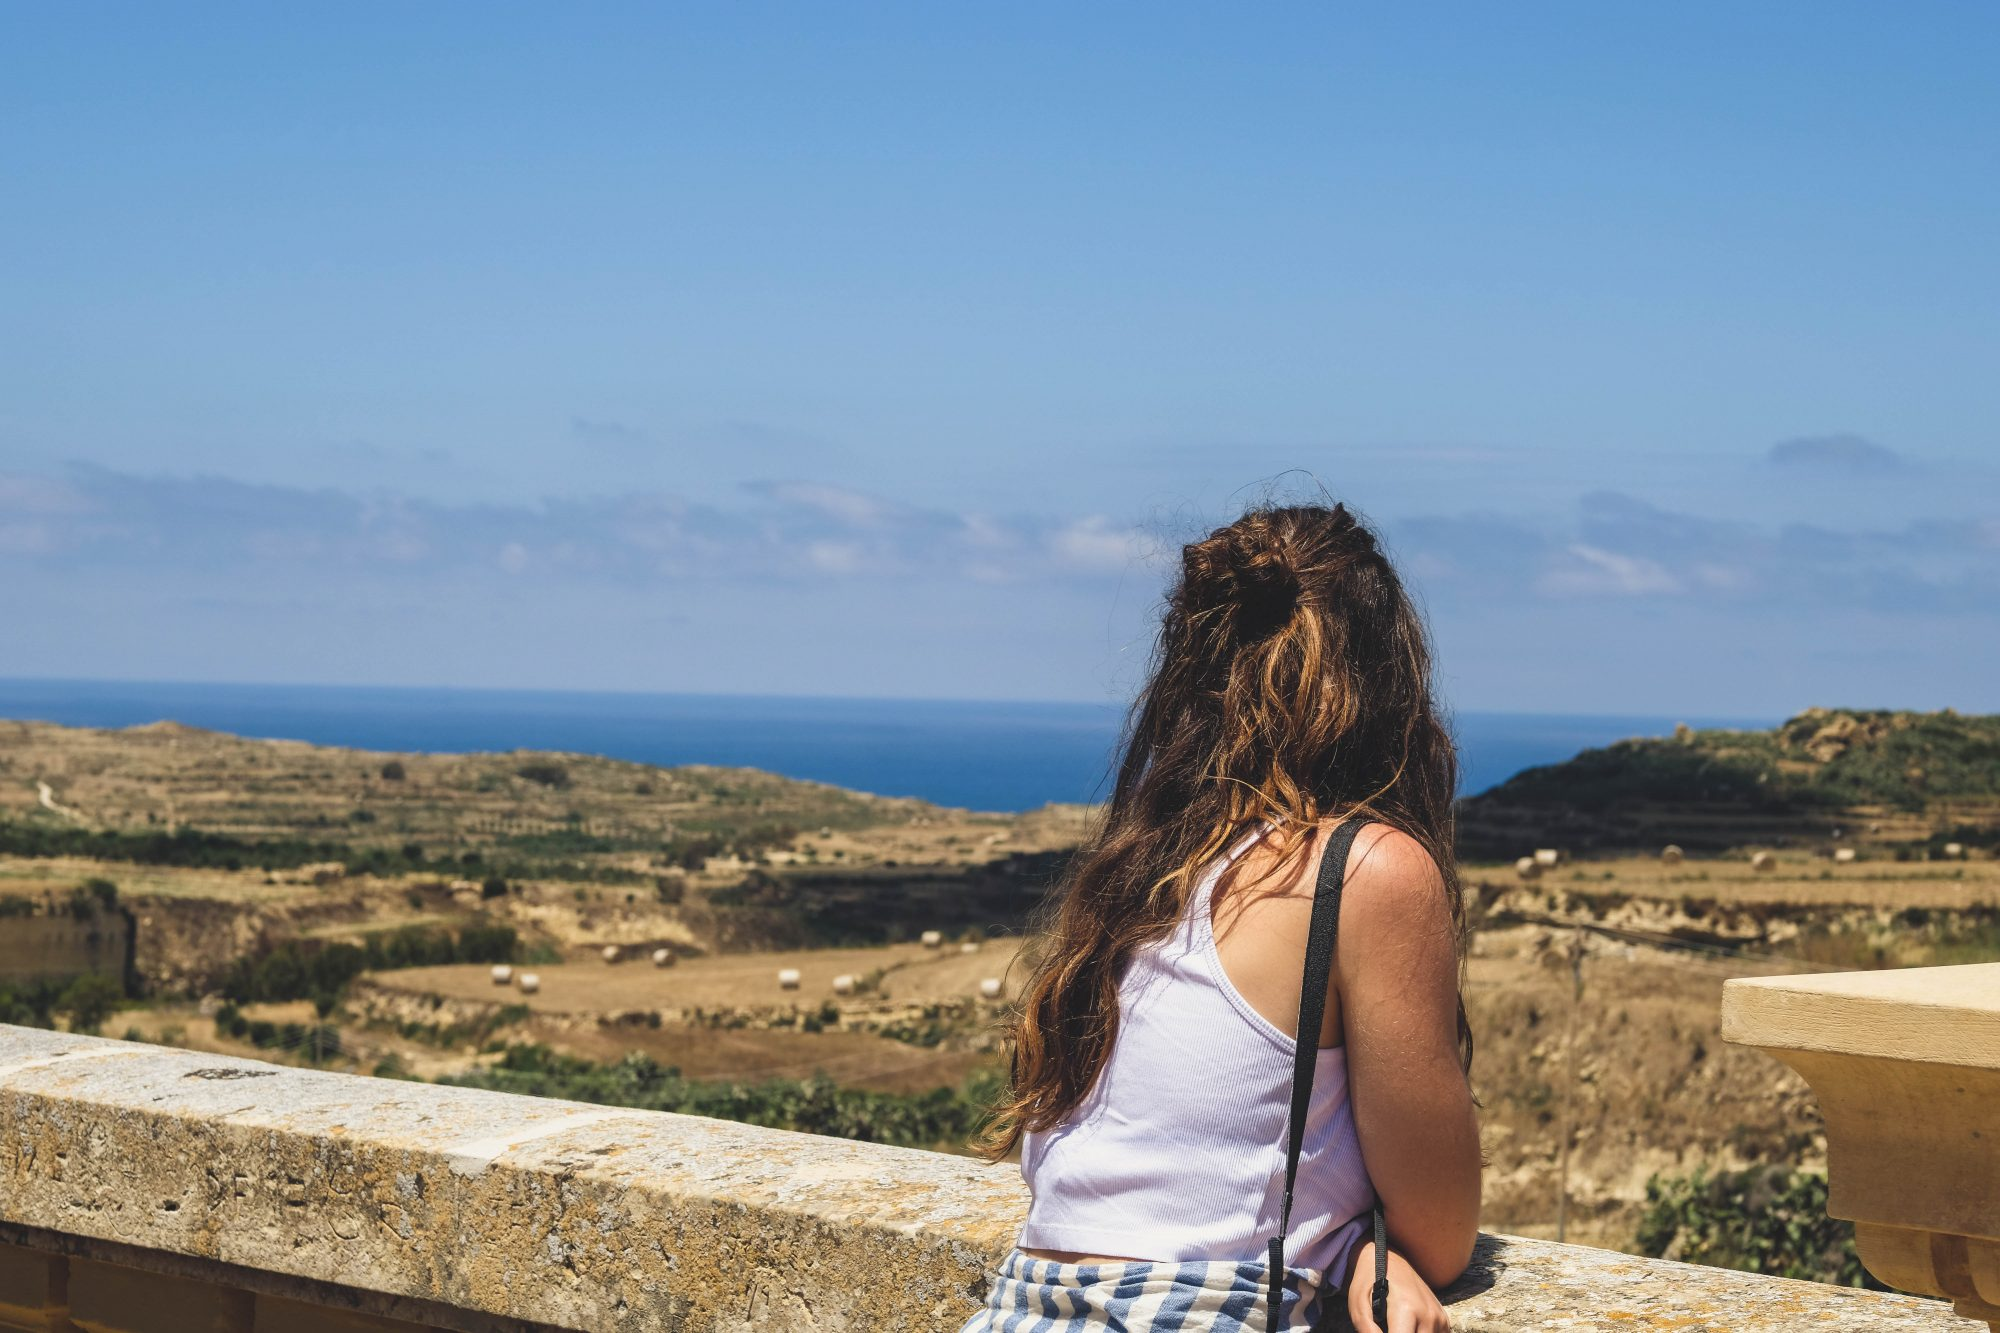 Vue sur la campagne de Gozo - Malte